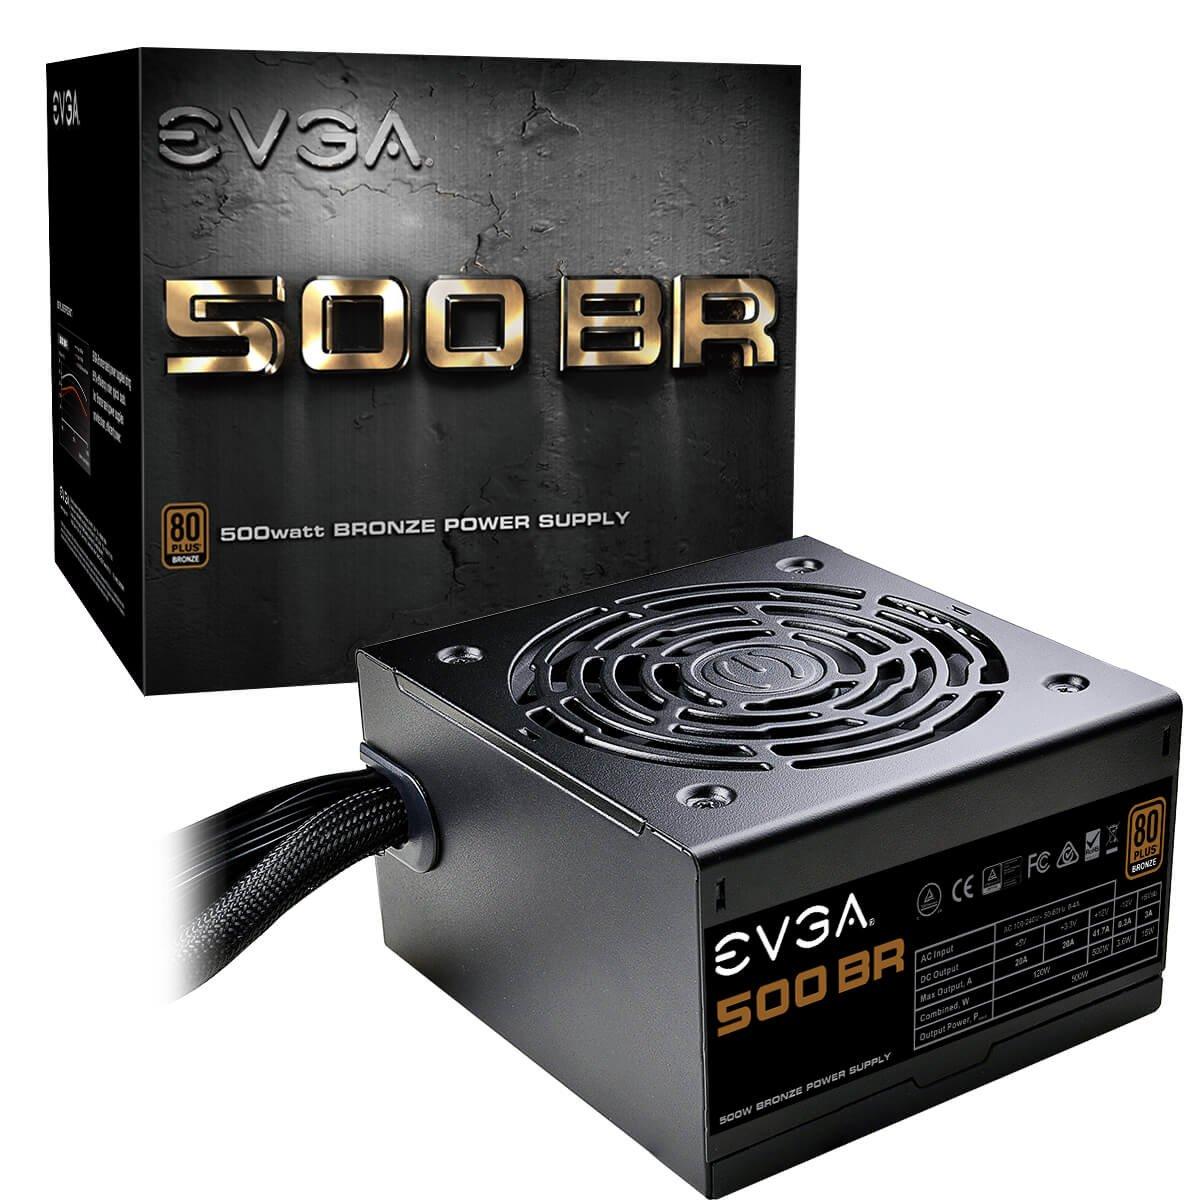 EVGA 500 BR, 80+ Bronze 500W, 3 Year Warranty, Power Supply 100- BR-0500-K1 100-BR-0500-K1